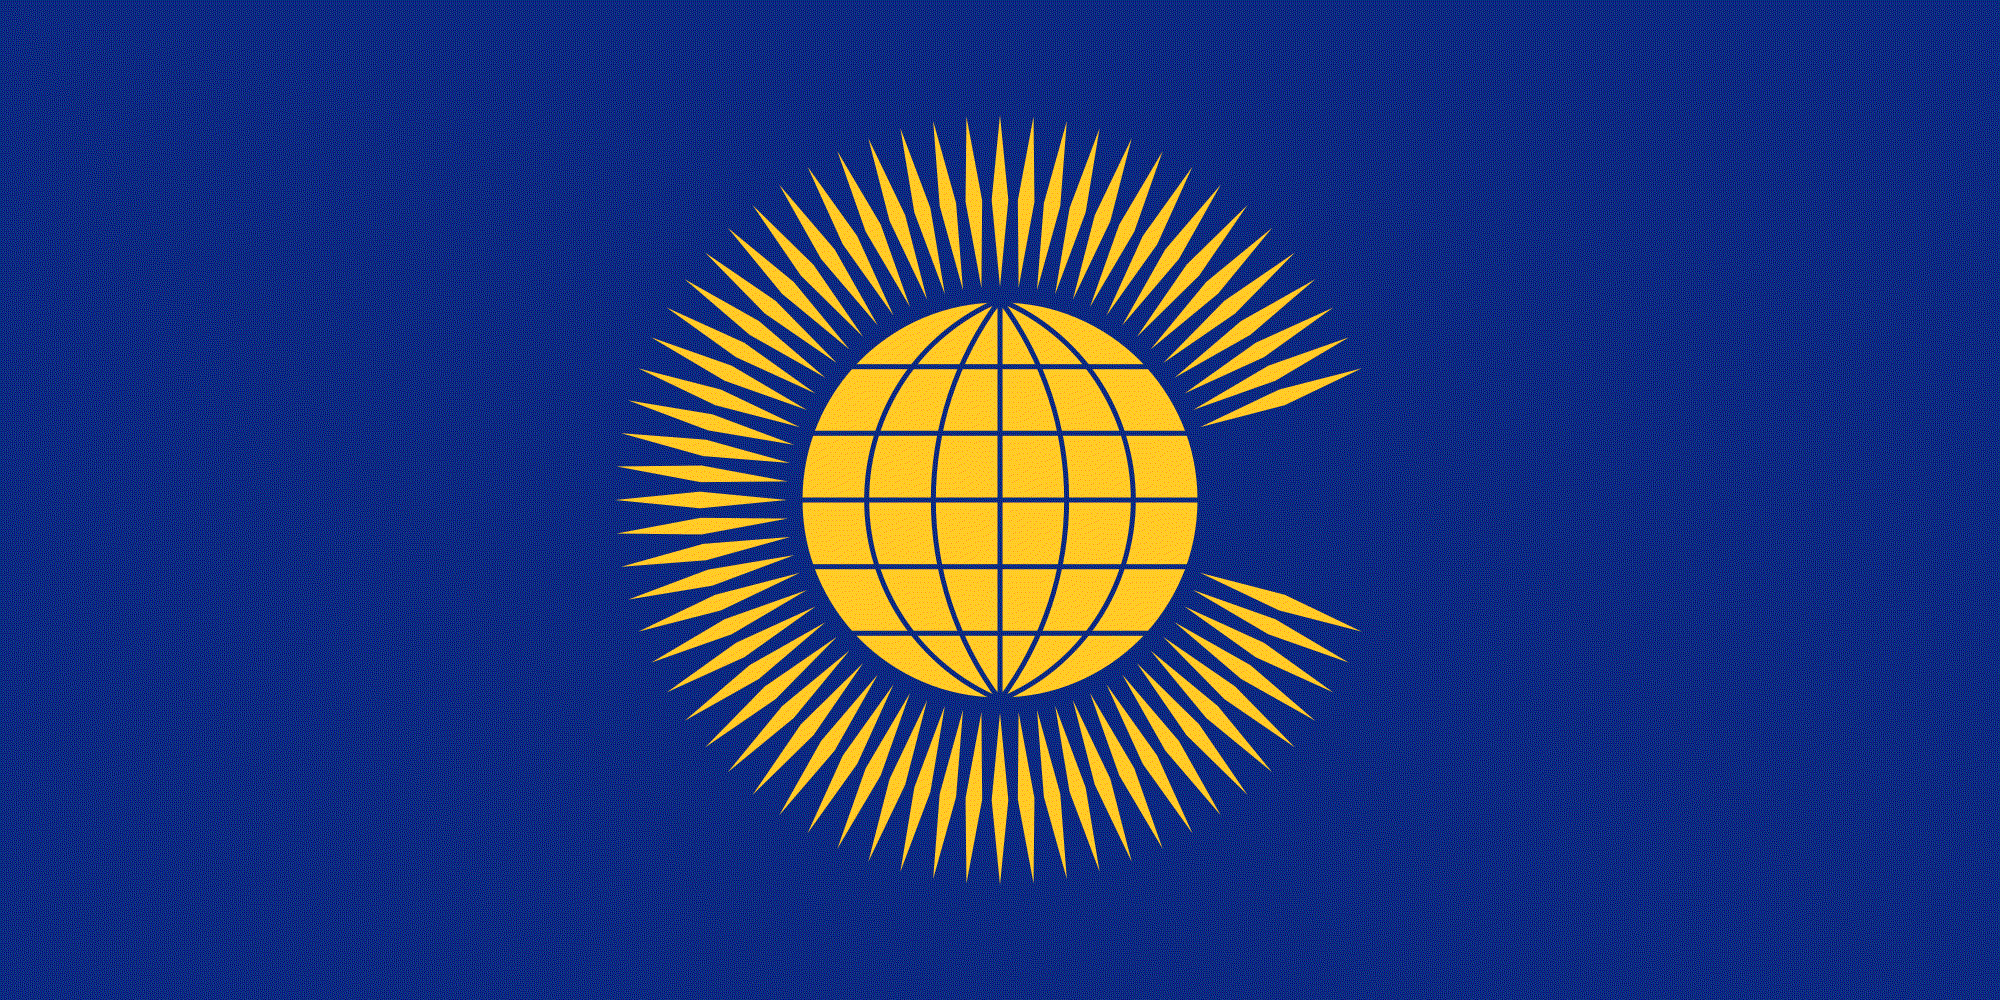 commonwealth-flag-2000x1000